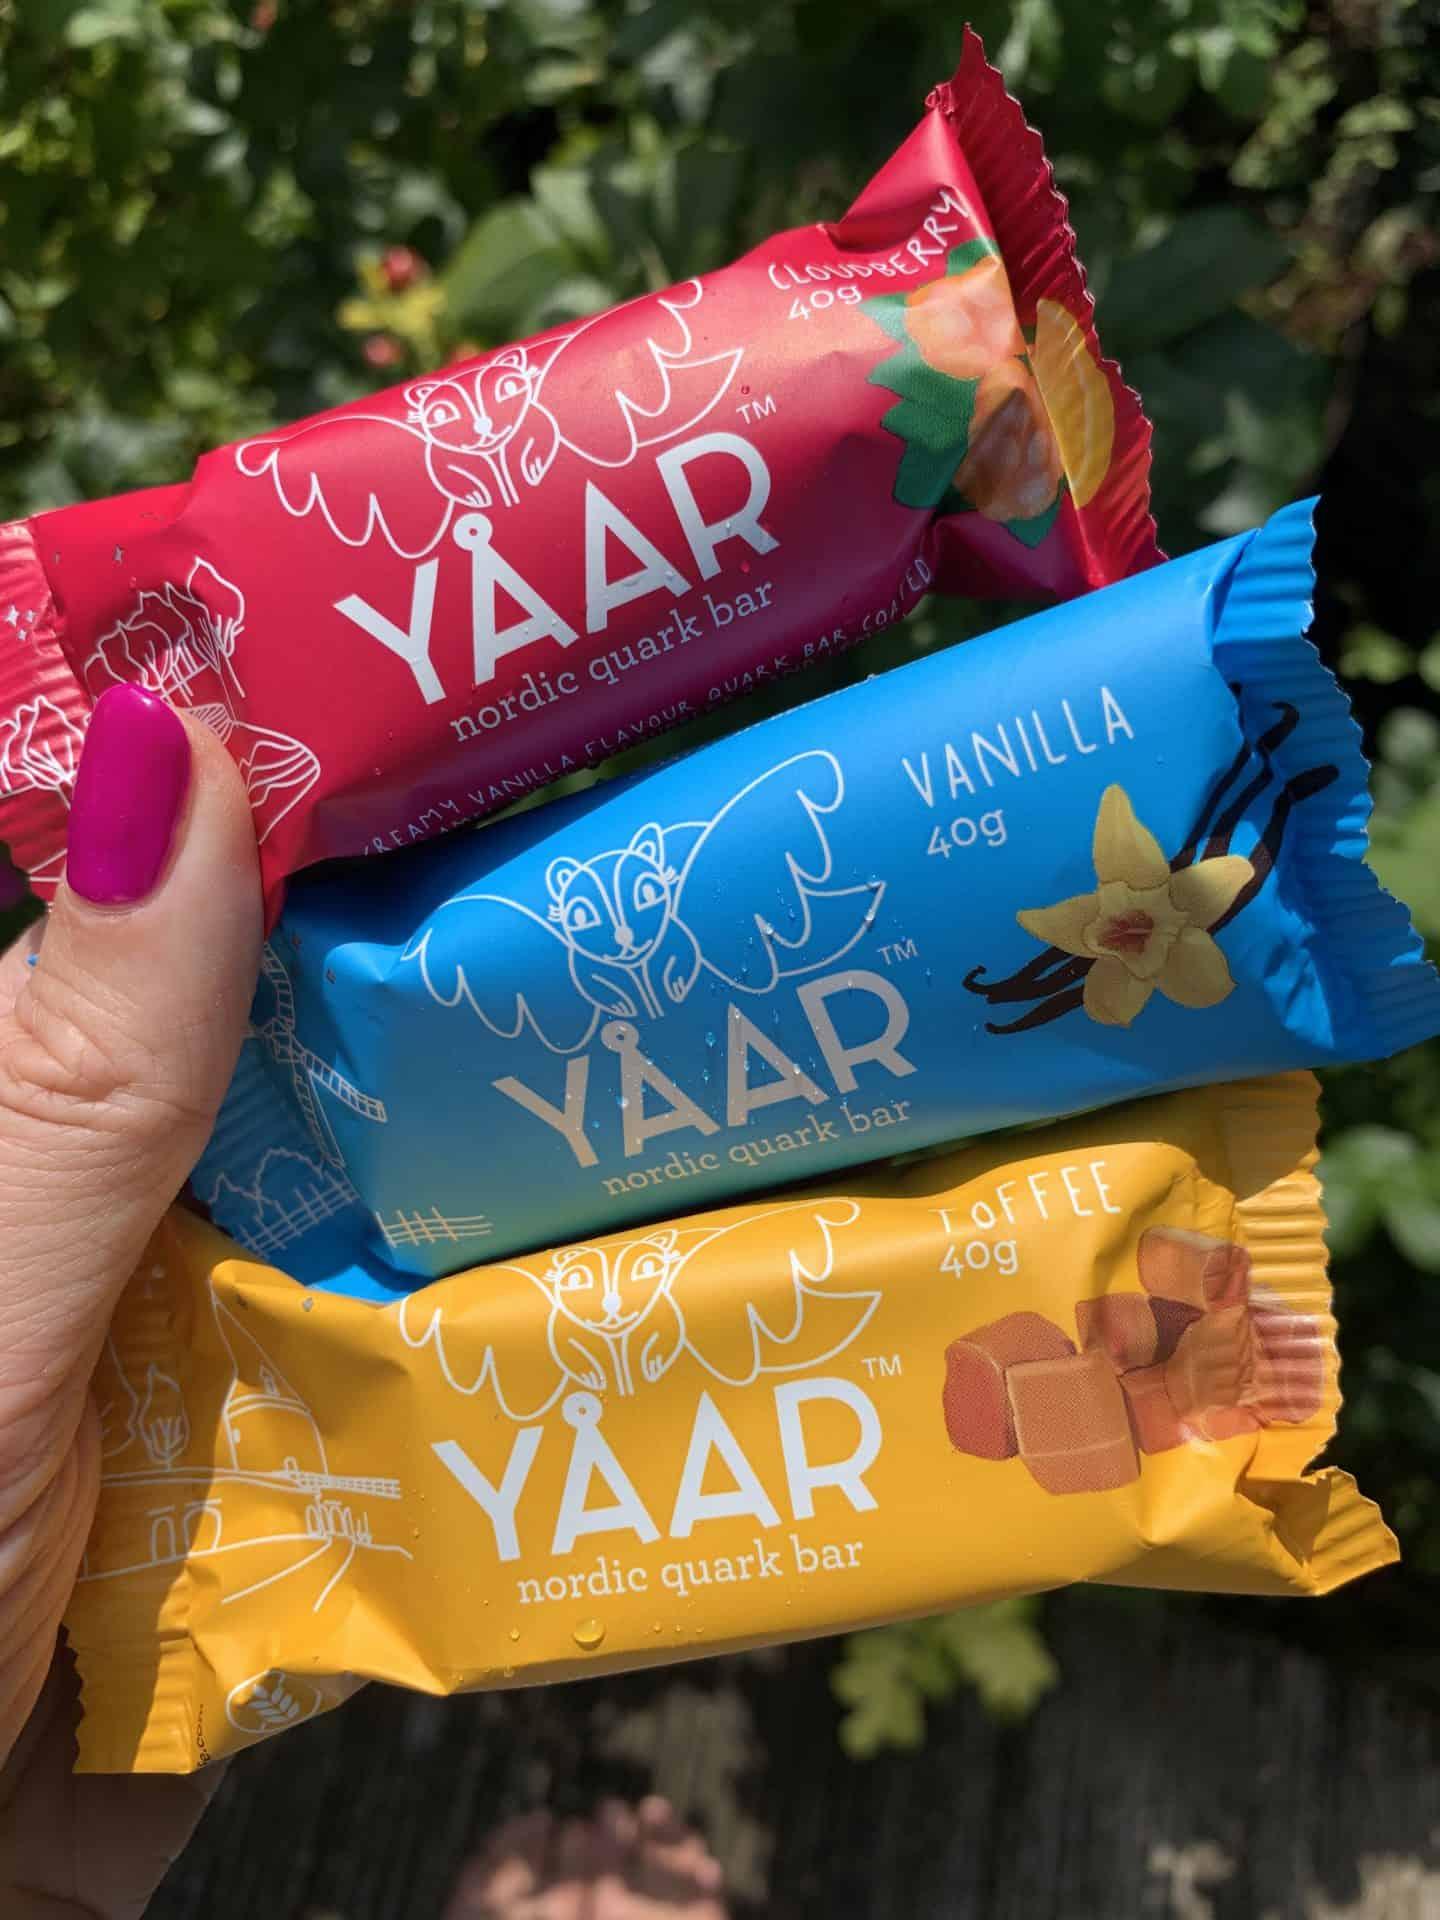 gluten free finds uk 2019 yaar bars